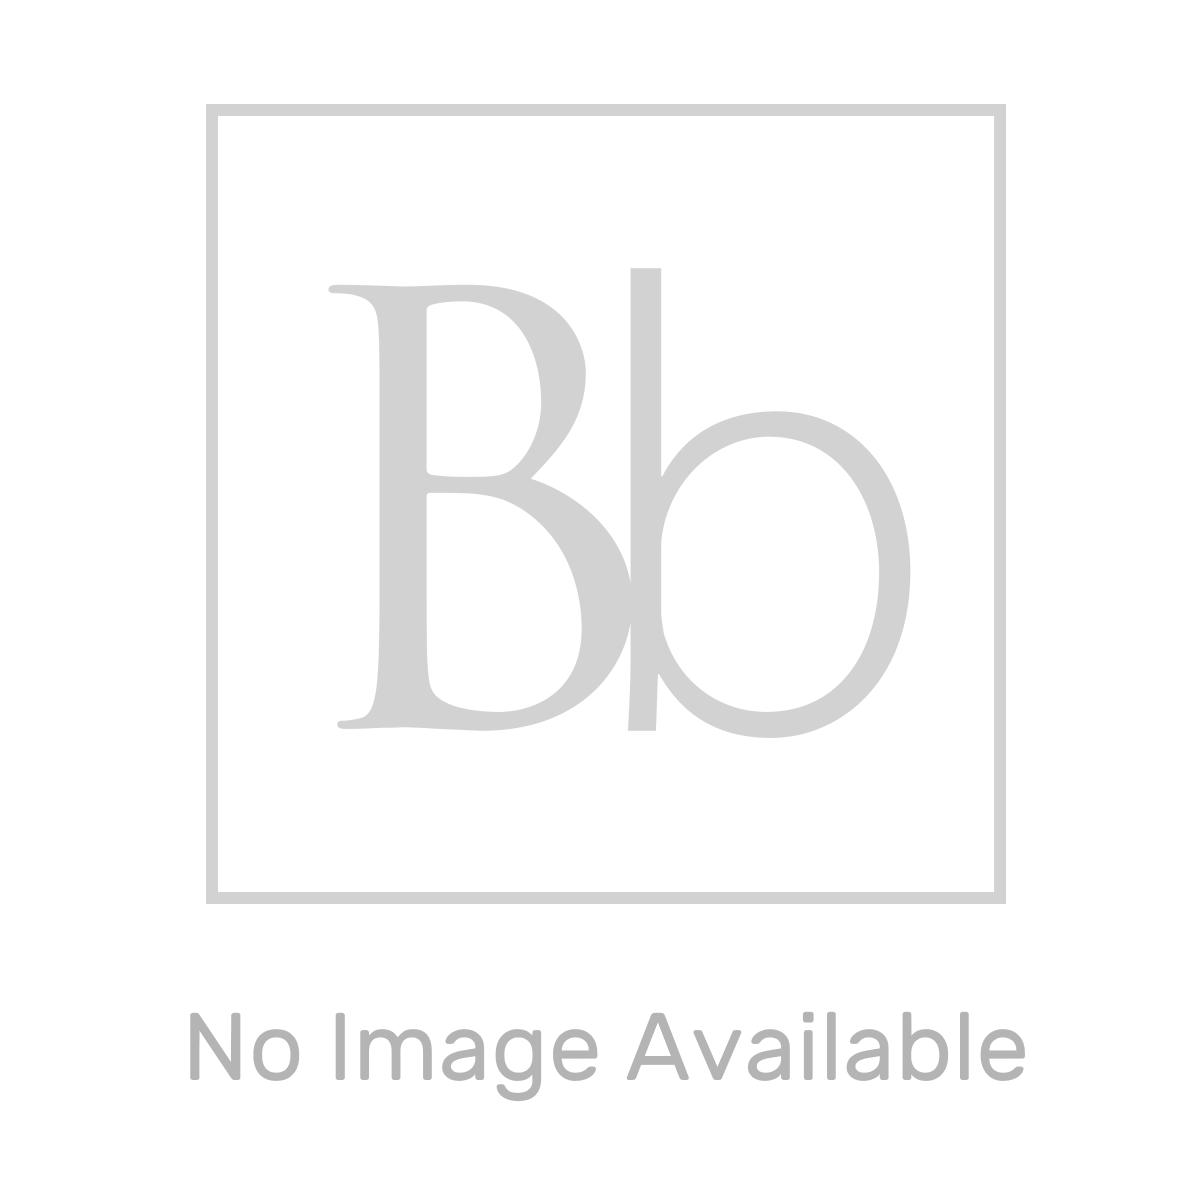 RAK Feeling Greige Rectangular Shower Tray 1600 x 800mm Measurements